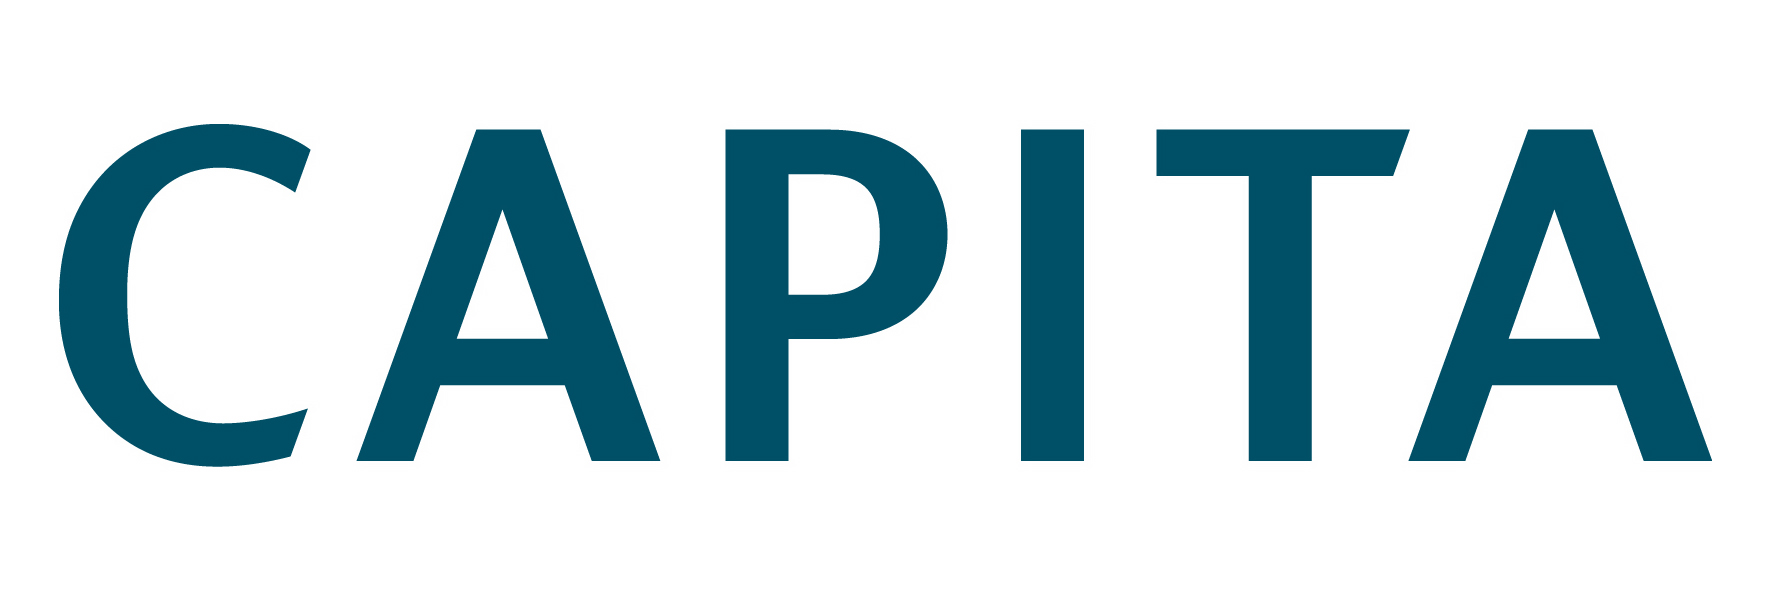 Capita-plc-logo